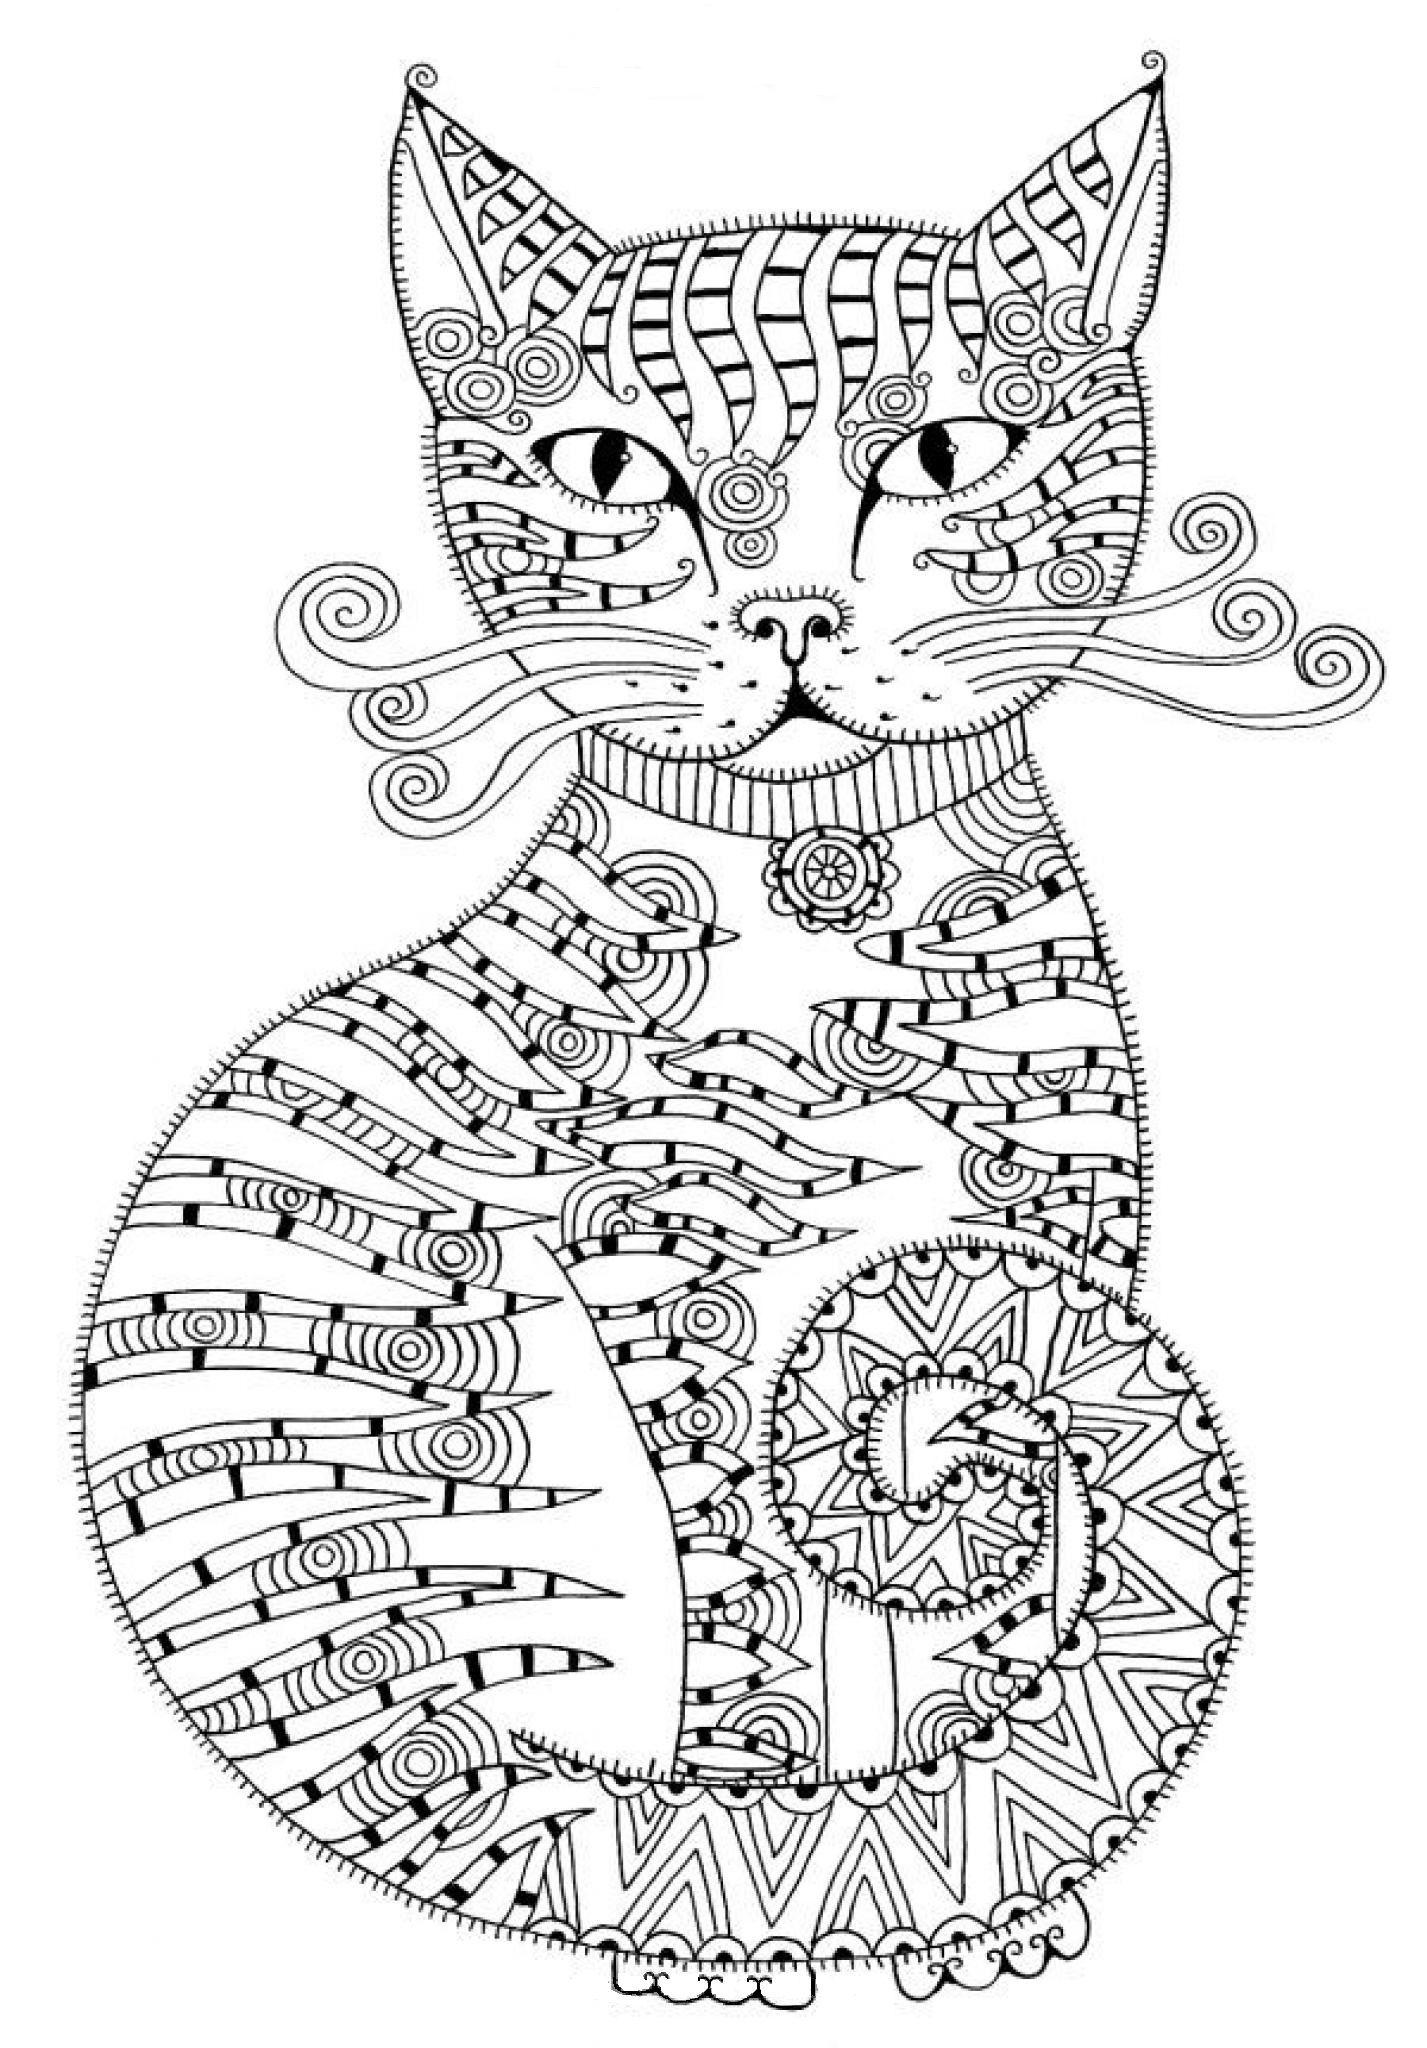 Ажурные трафареты котов | Котеко | Color A Kitty! | Pinterest ...